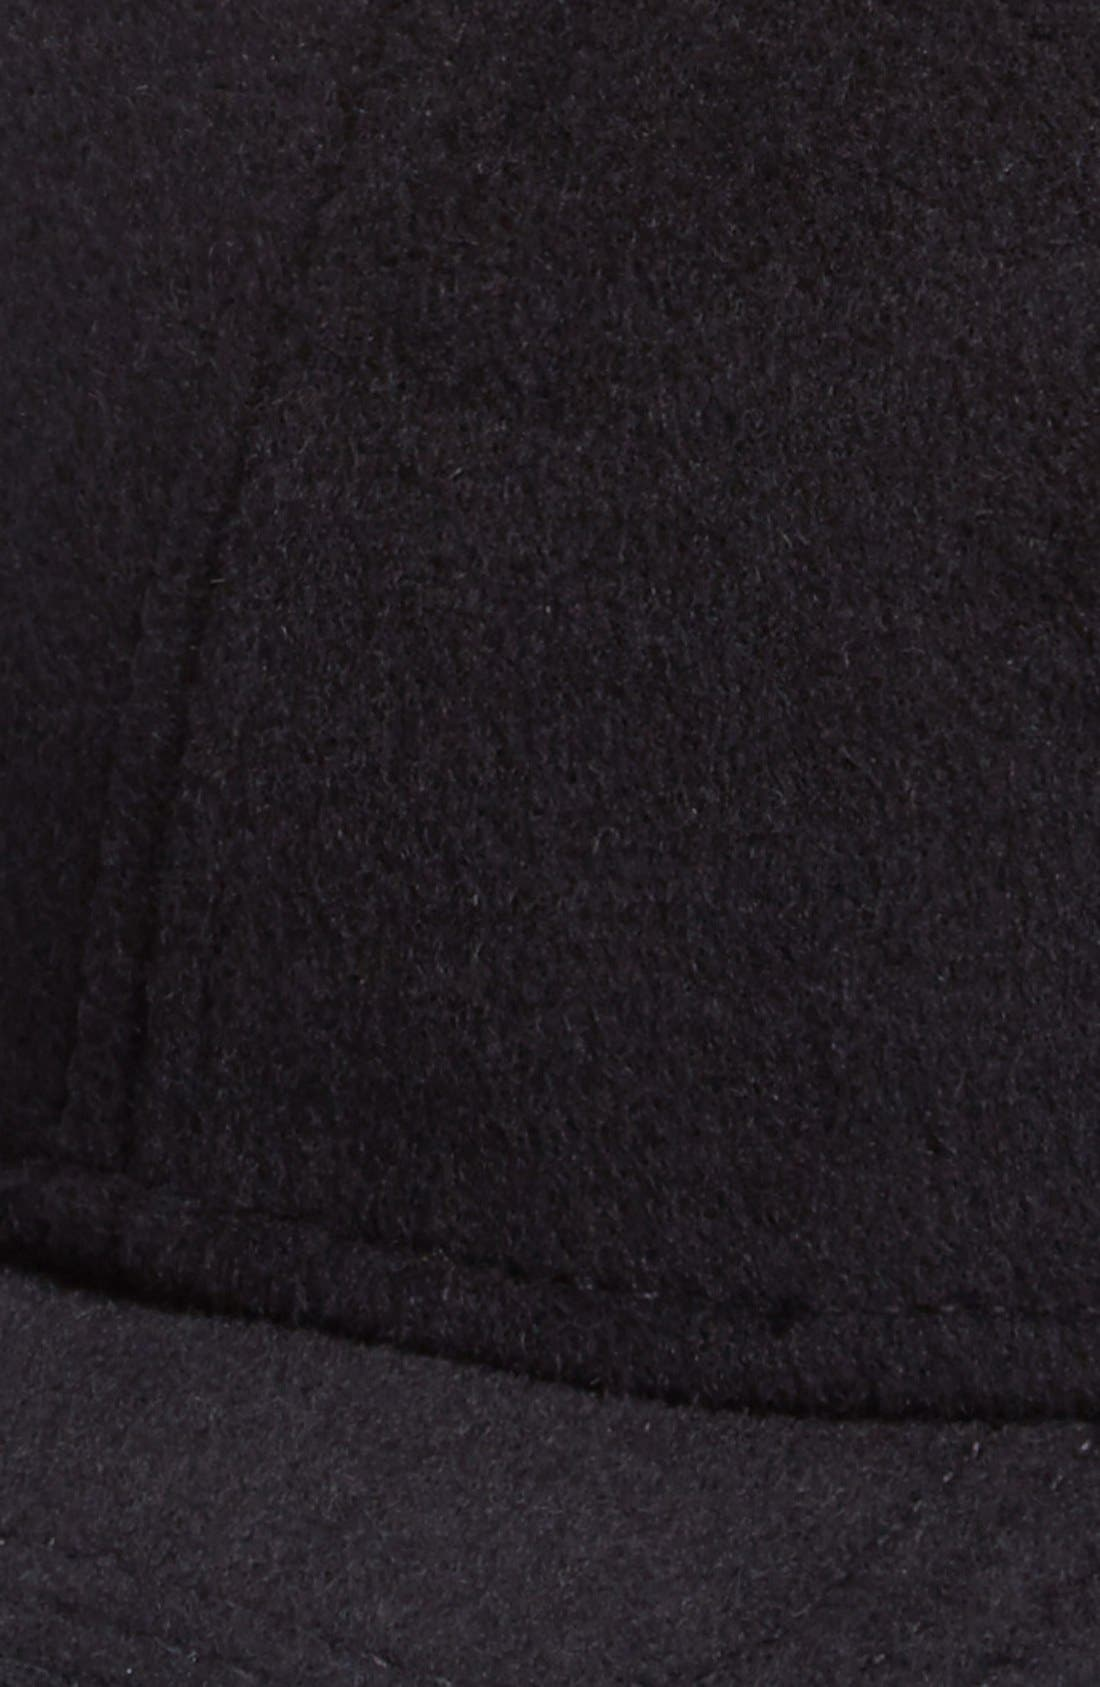 Textured Baseball Cap,                             Alternate thumbnail 2, color,                             001